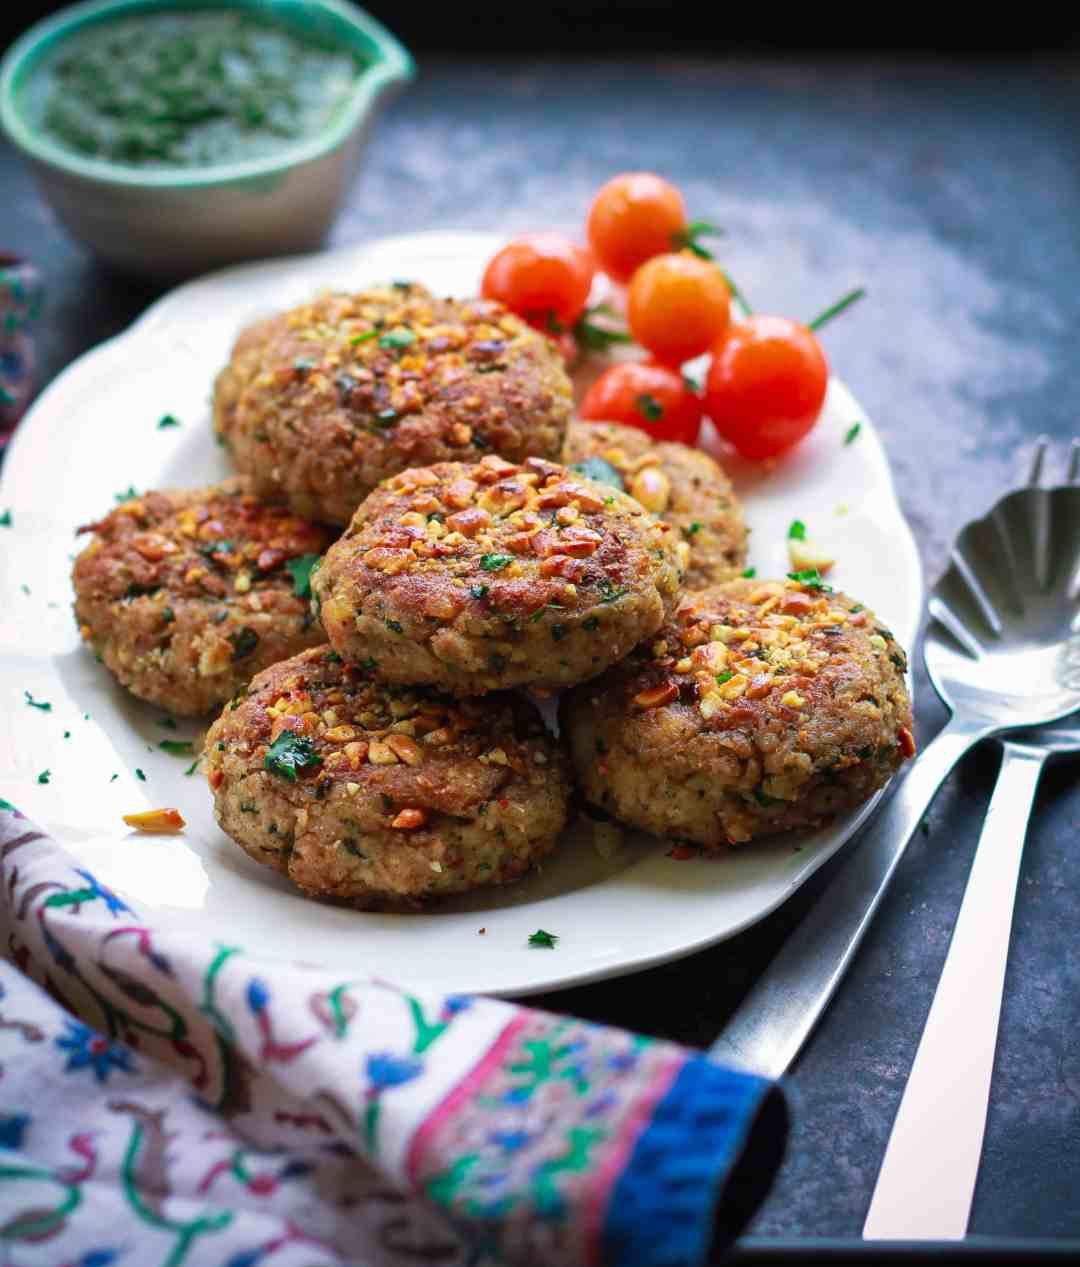 Raw Banana & Millet Cutlets vrat ka khana Indian fasting food vegan glutenfree healthy recipe